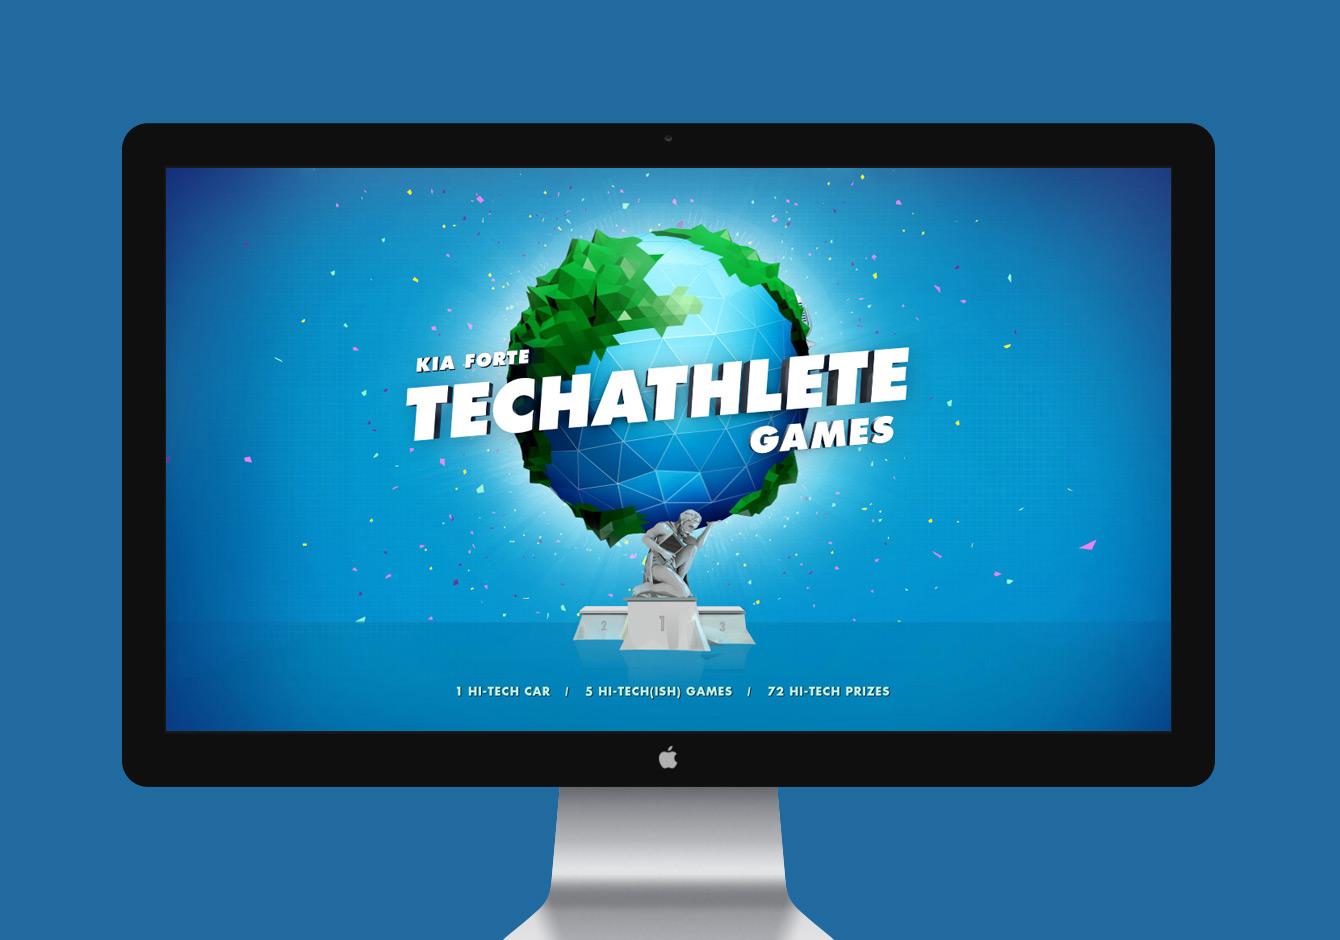 KIA Techathlete Games